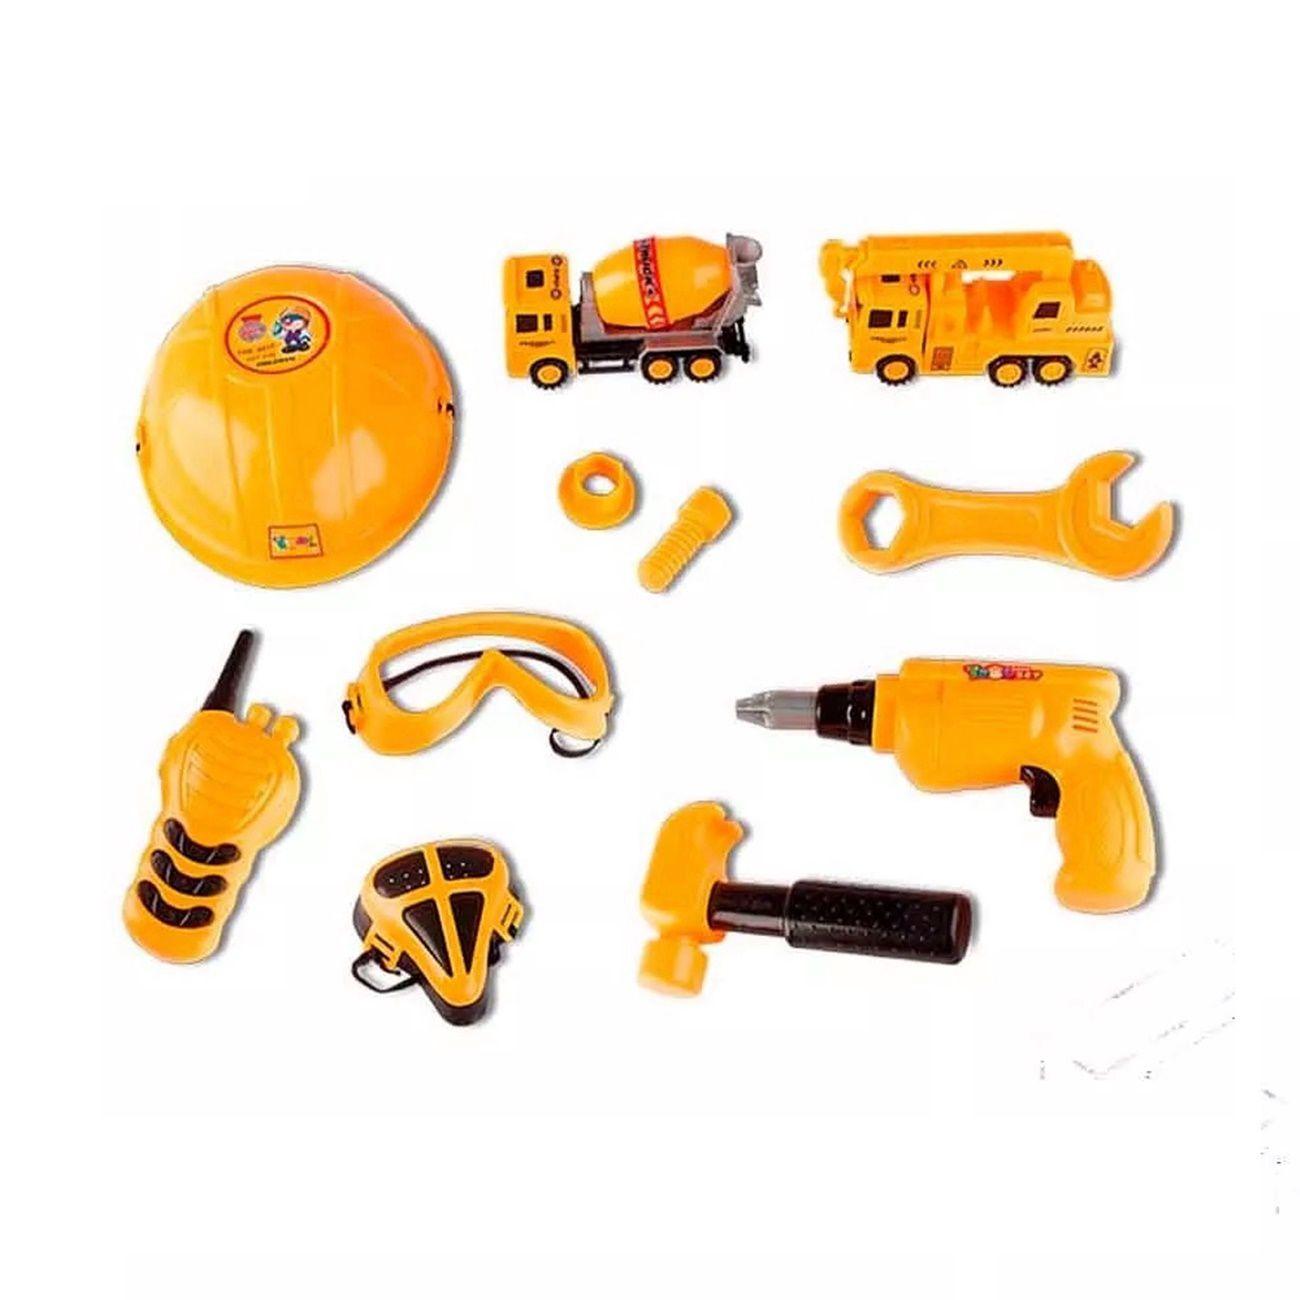 Kit Construção Delux Mãos à Obra - Zoop Toys